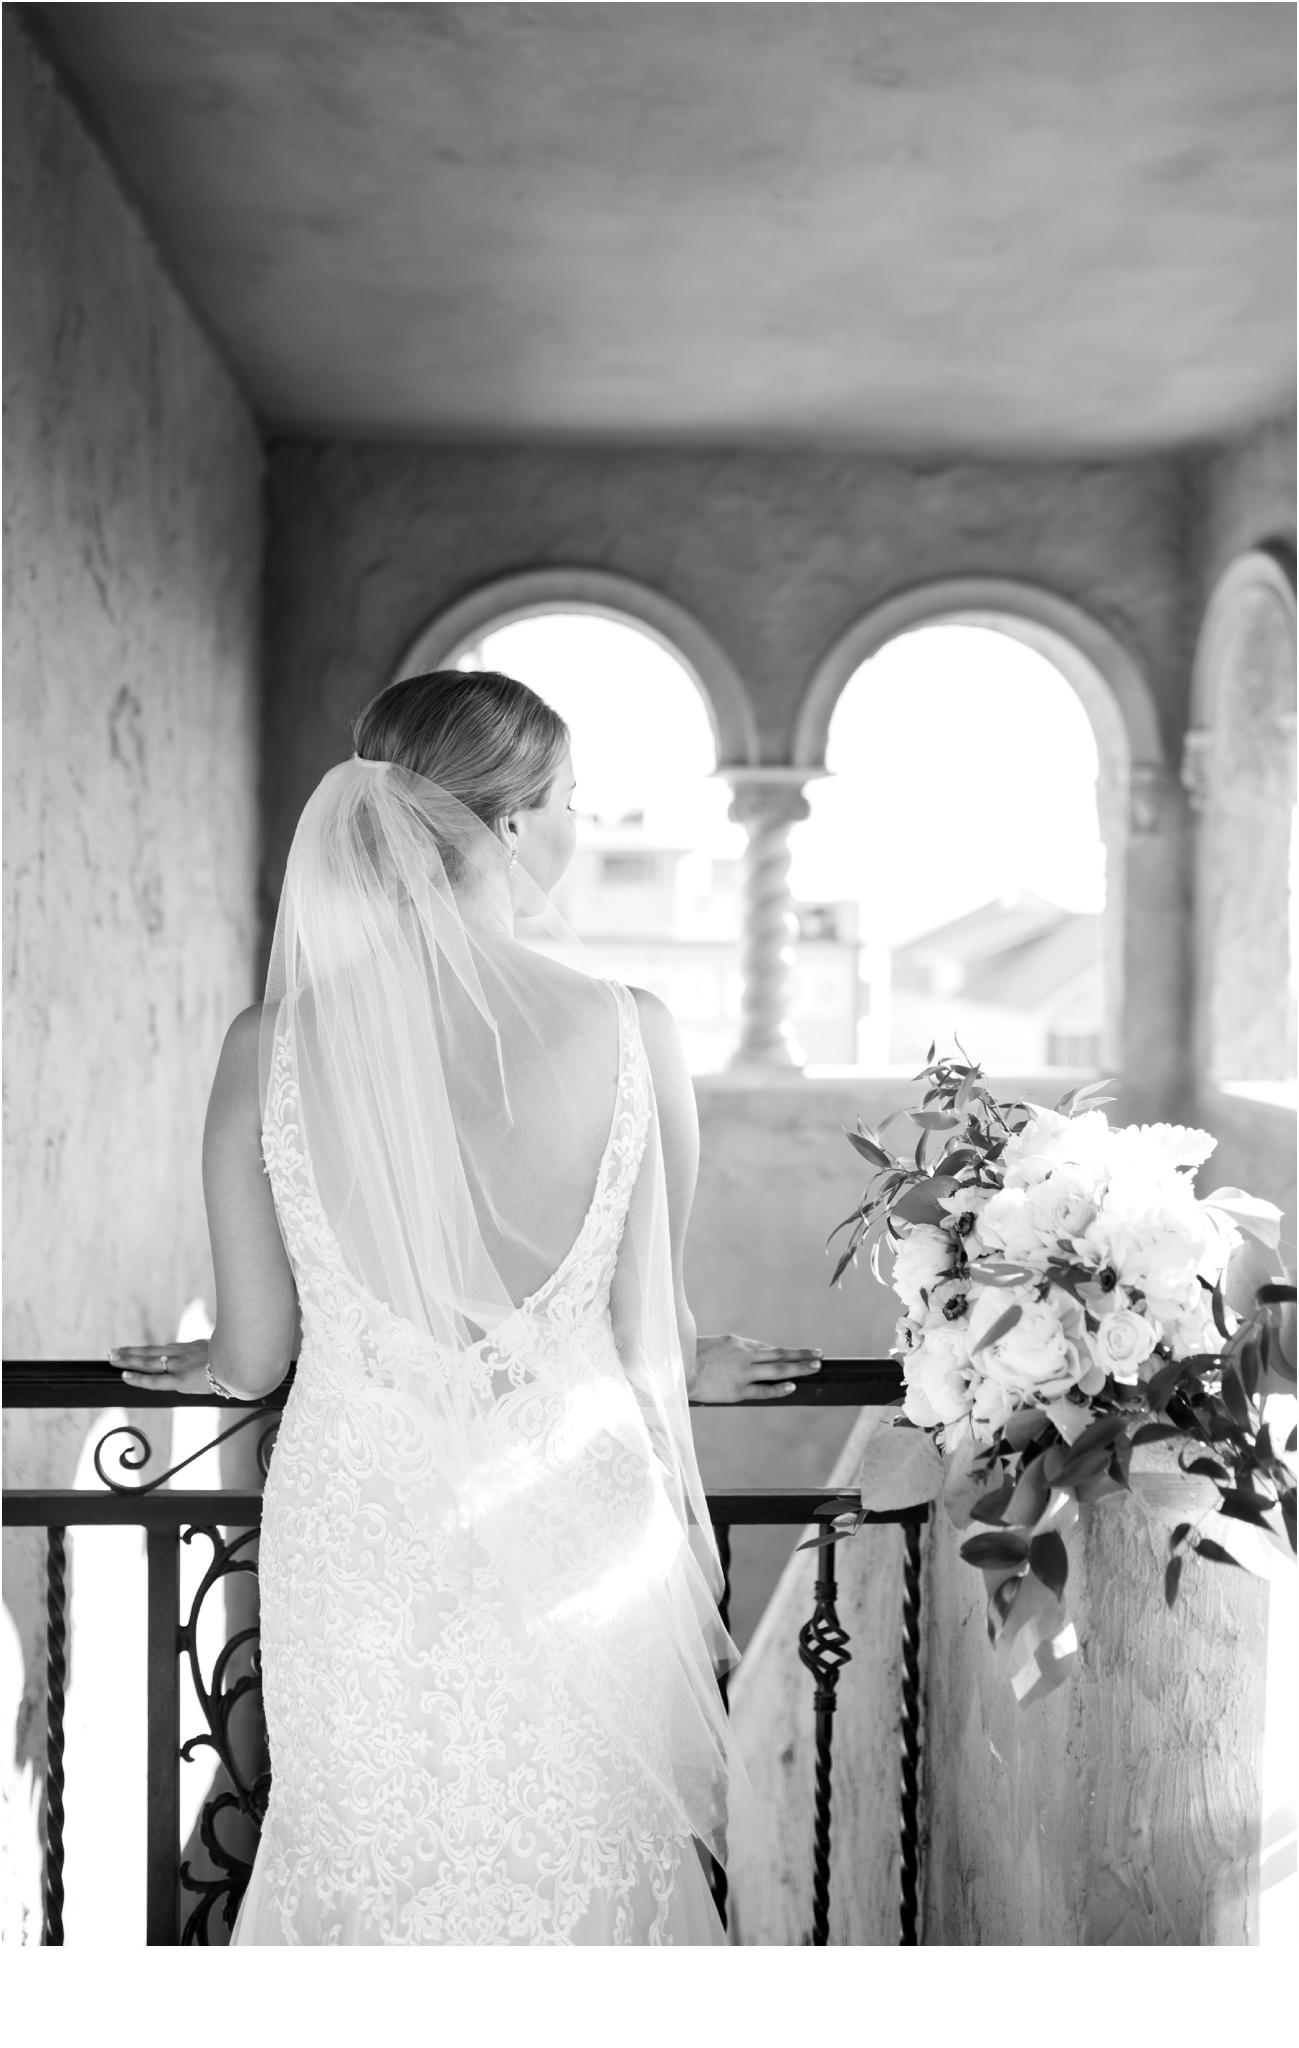 Rainey_Gregg_Photography_St._Simons_Island_Georgia_California_Wedding_Portrait_Photography_0663.jpg